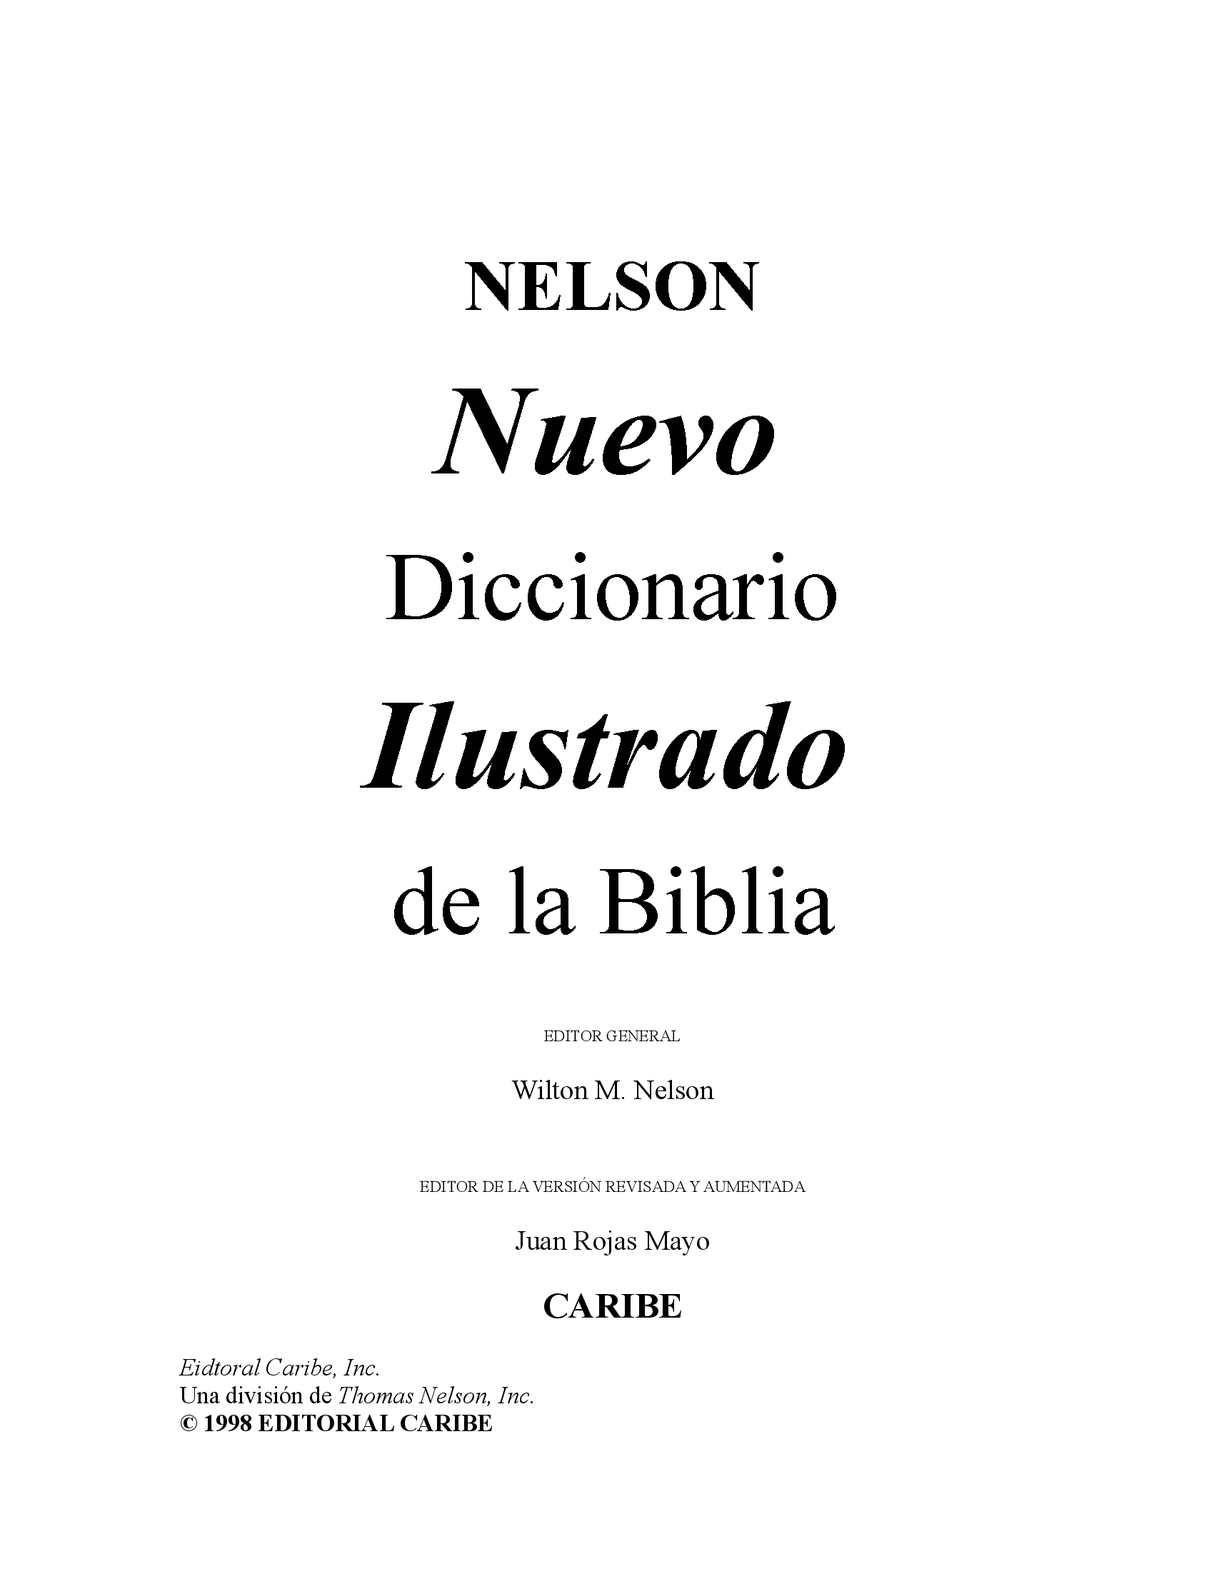 Calaméo - Diccionario ilustrado de la Biblia. Por: Wilton M. Nelson